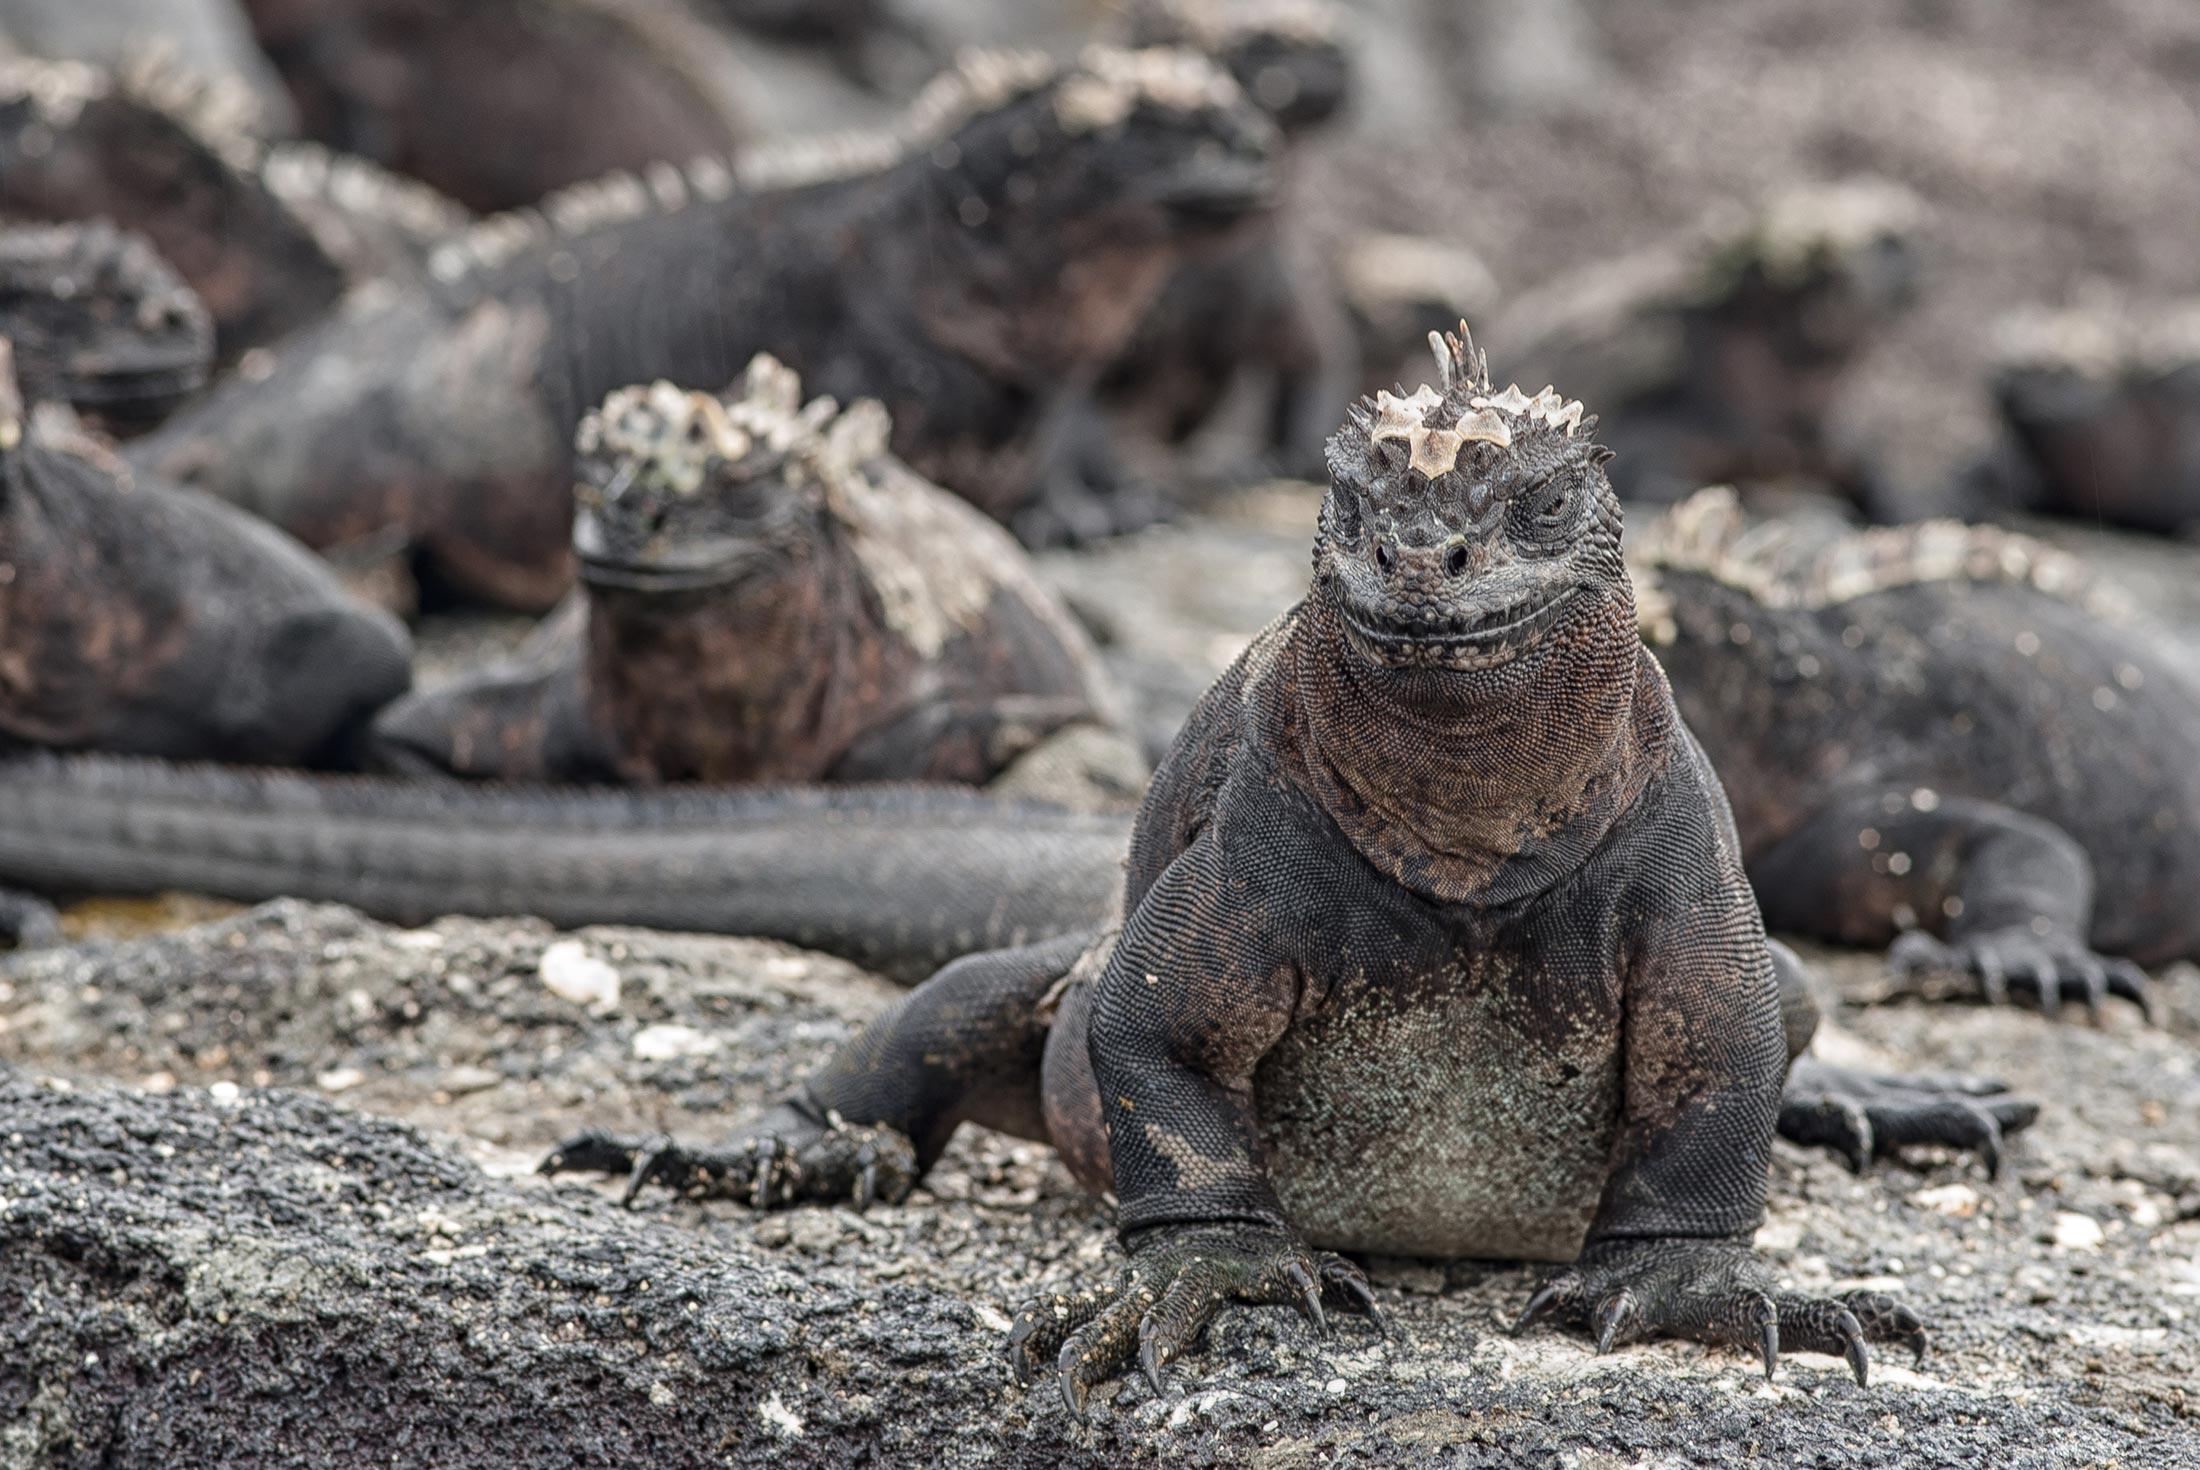 One Week in the Galapagos Islands 2